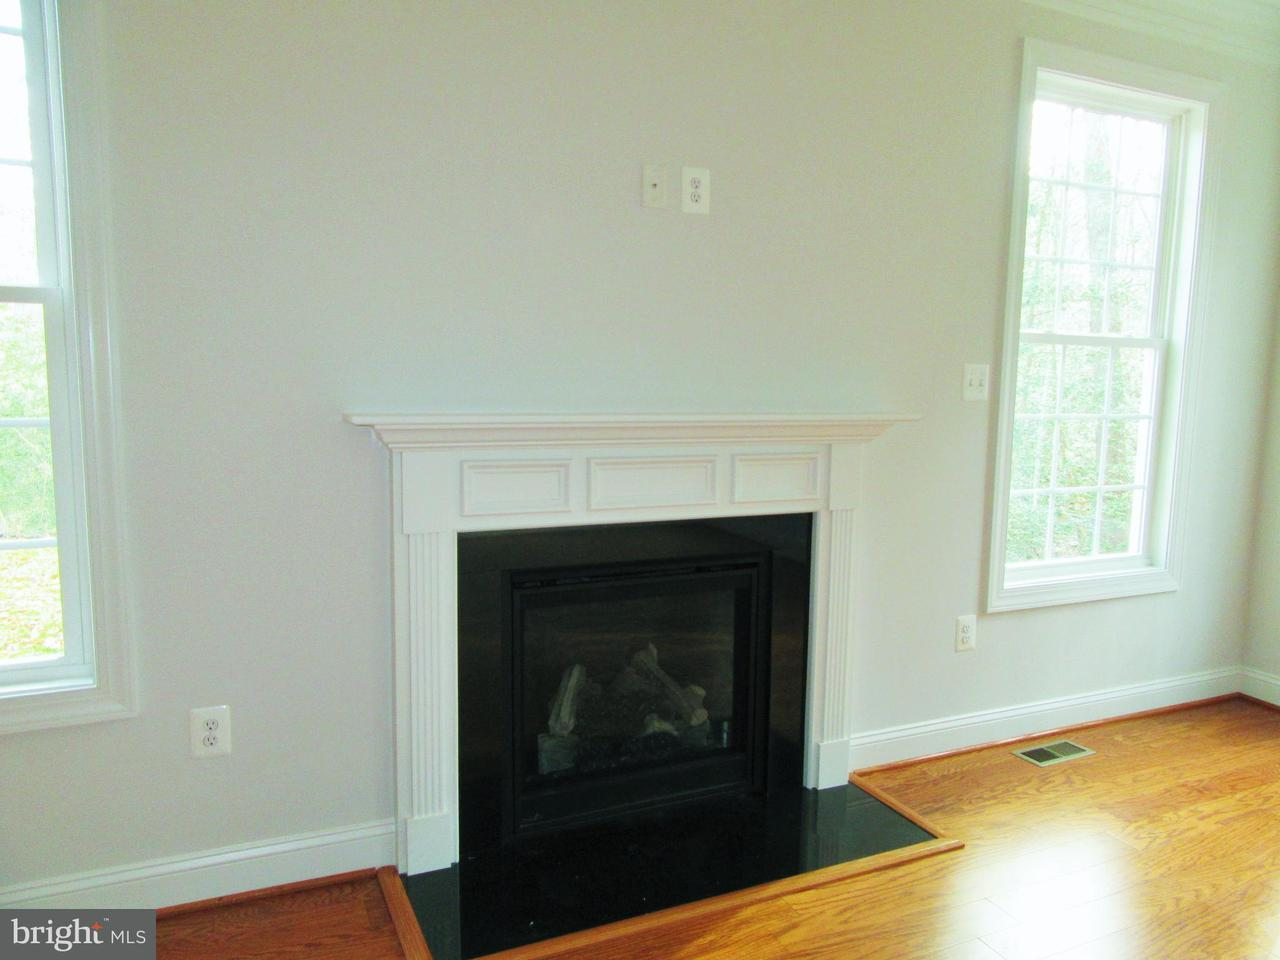 Additional photo for property listing at 36 Hidden Springs Lane 36 Hidden Springs Lane Stafford, 弗吉尼亞州 22554 美國